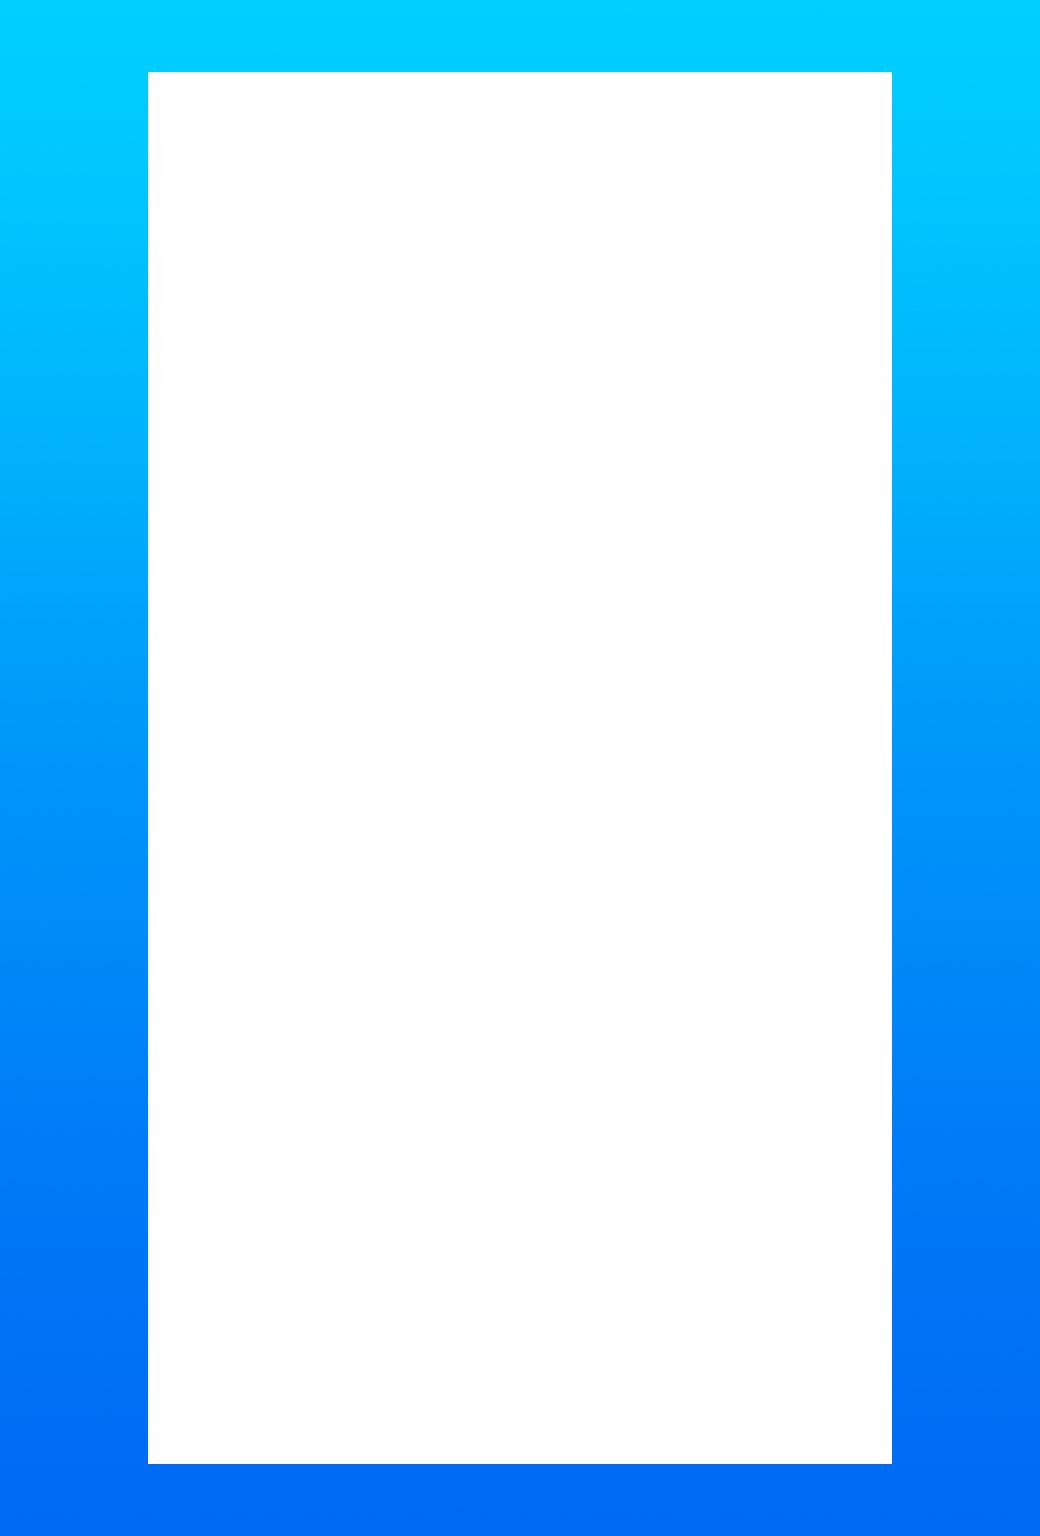 Ios11 Iphone棚壁紙 ドックが消える青グラデーション壁紙 Wallpaper